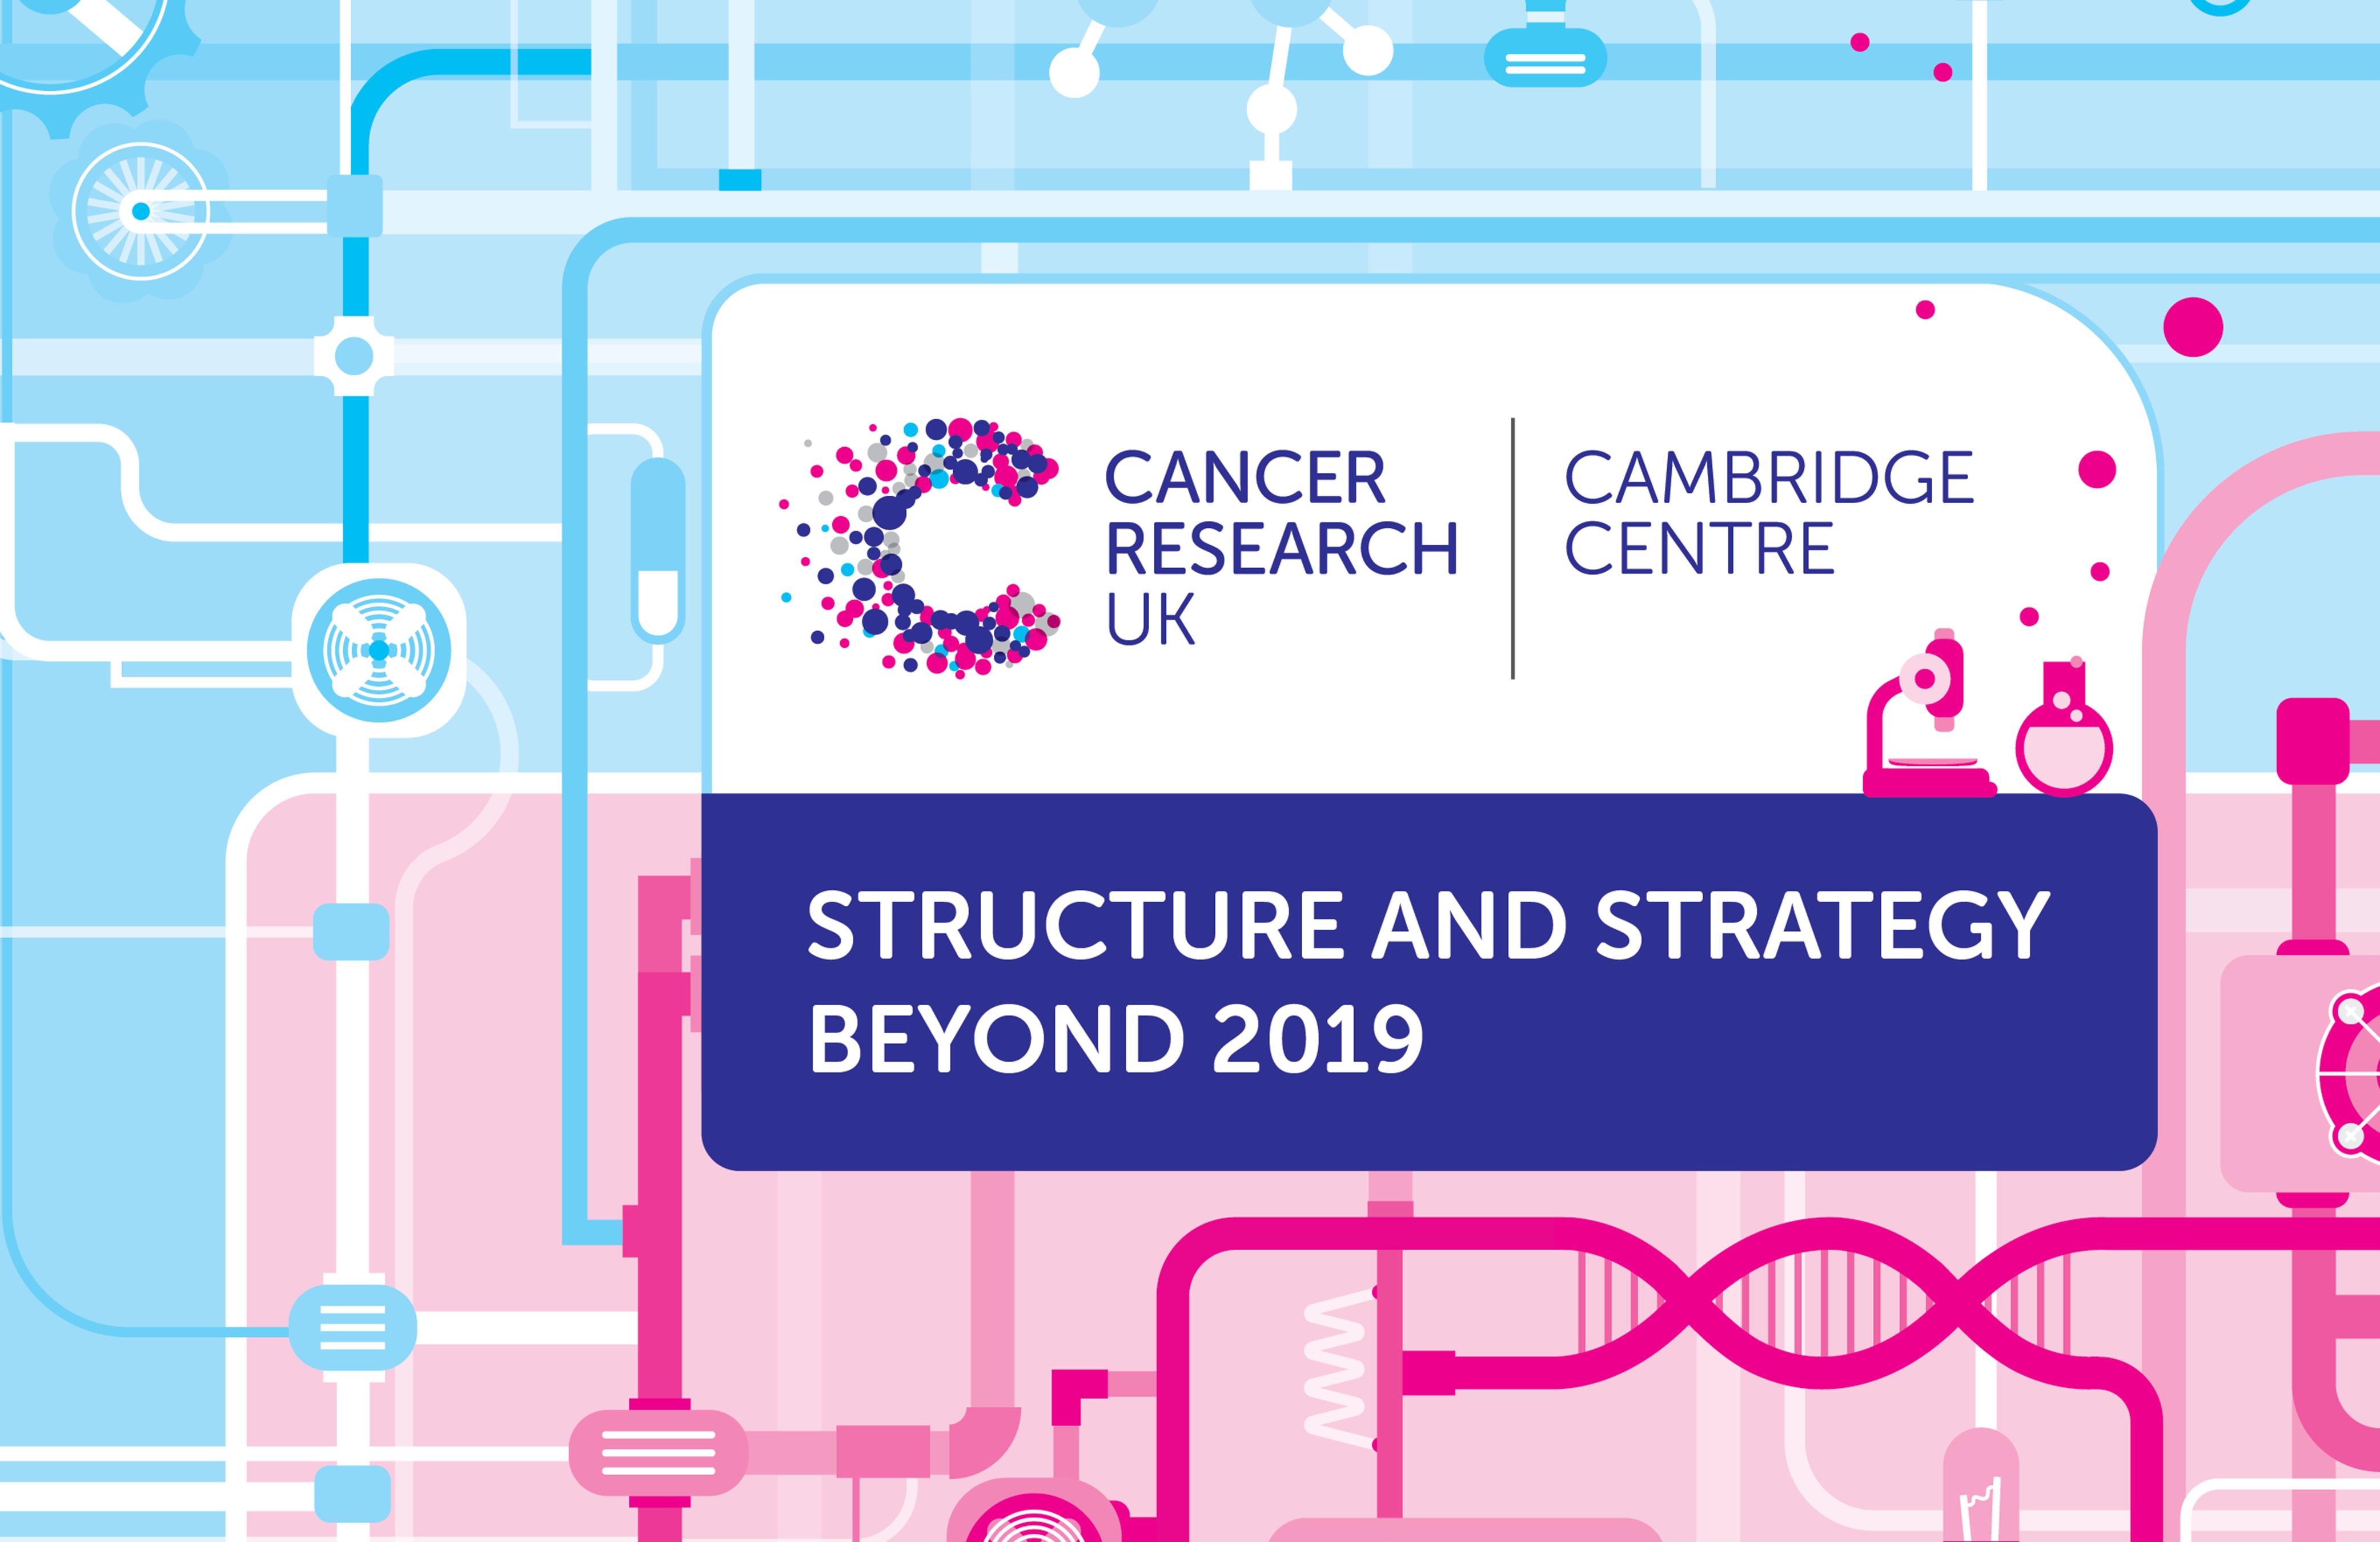 sarcoma cancer research uk viermisori oxiuri